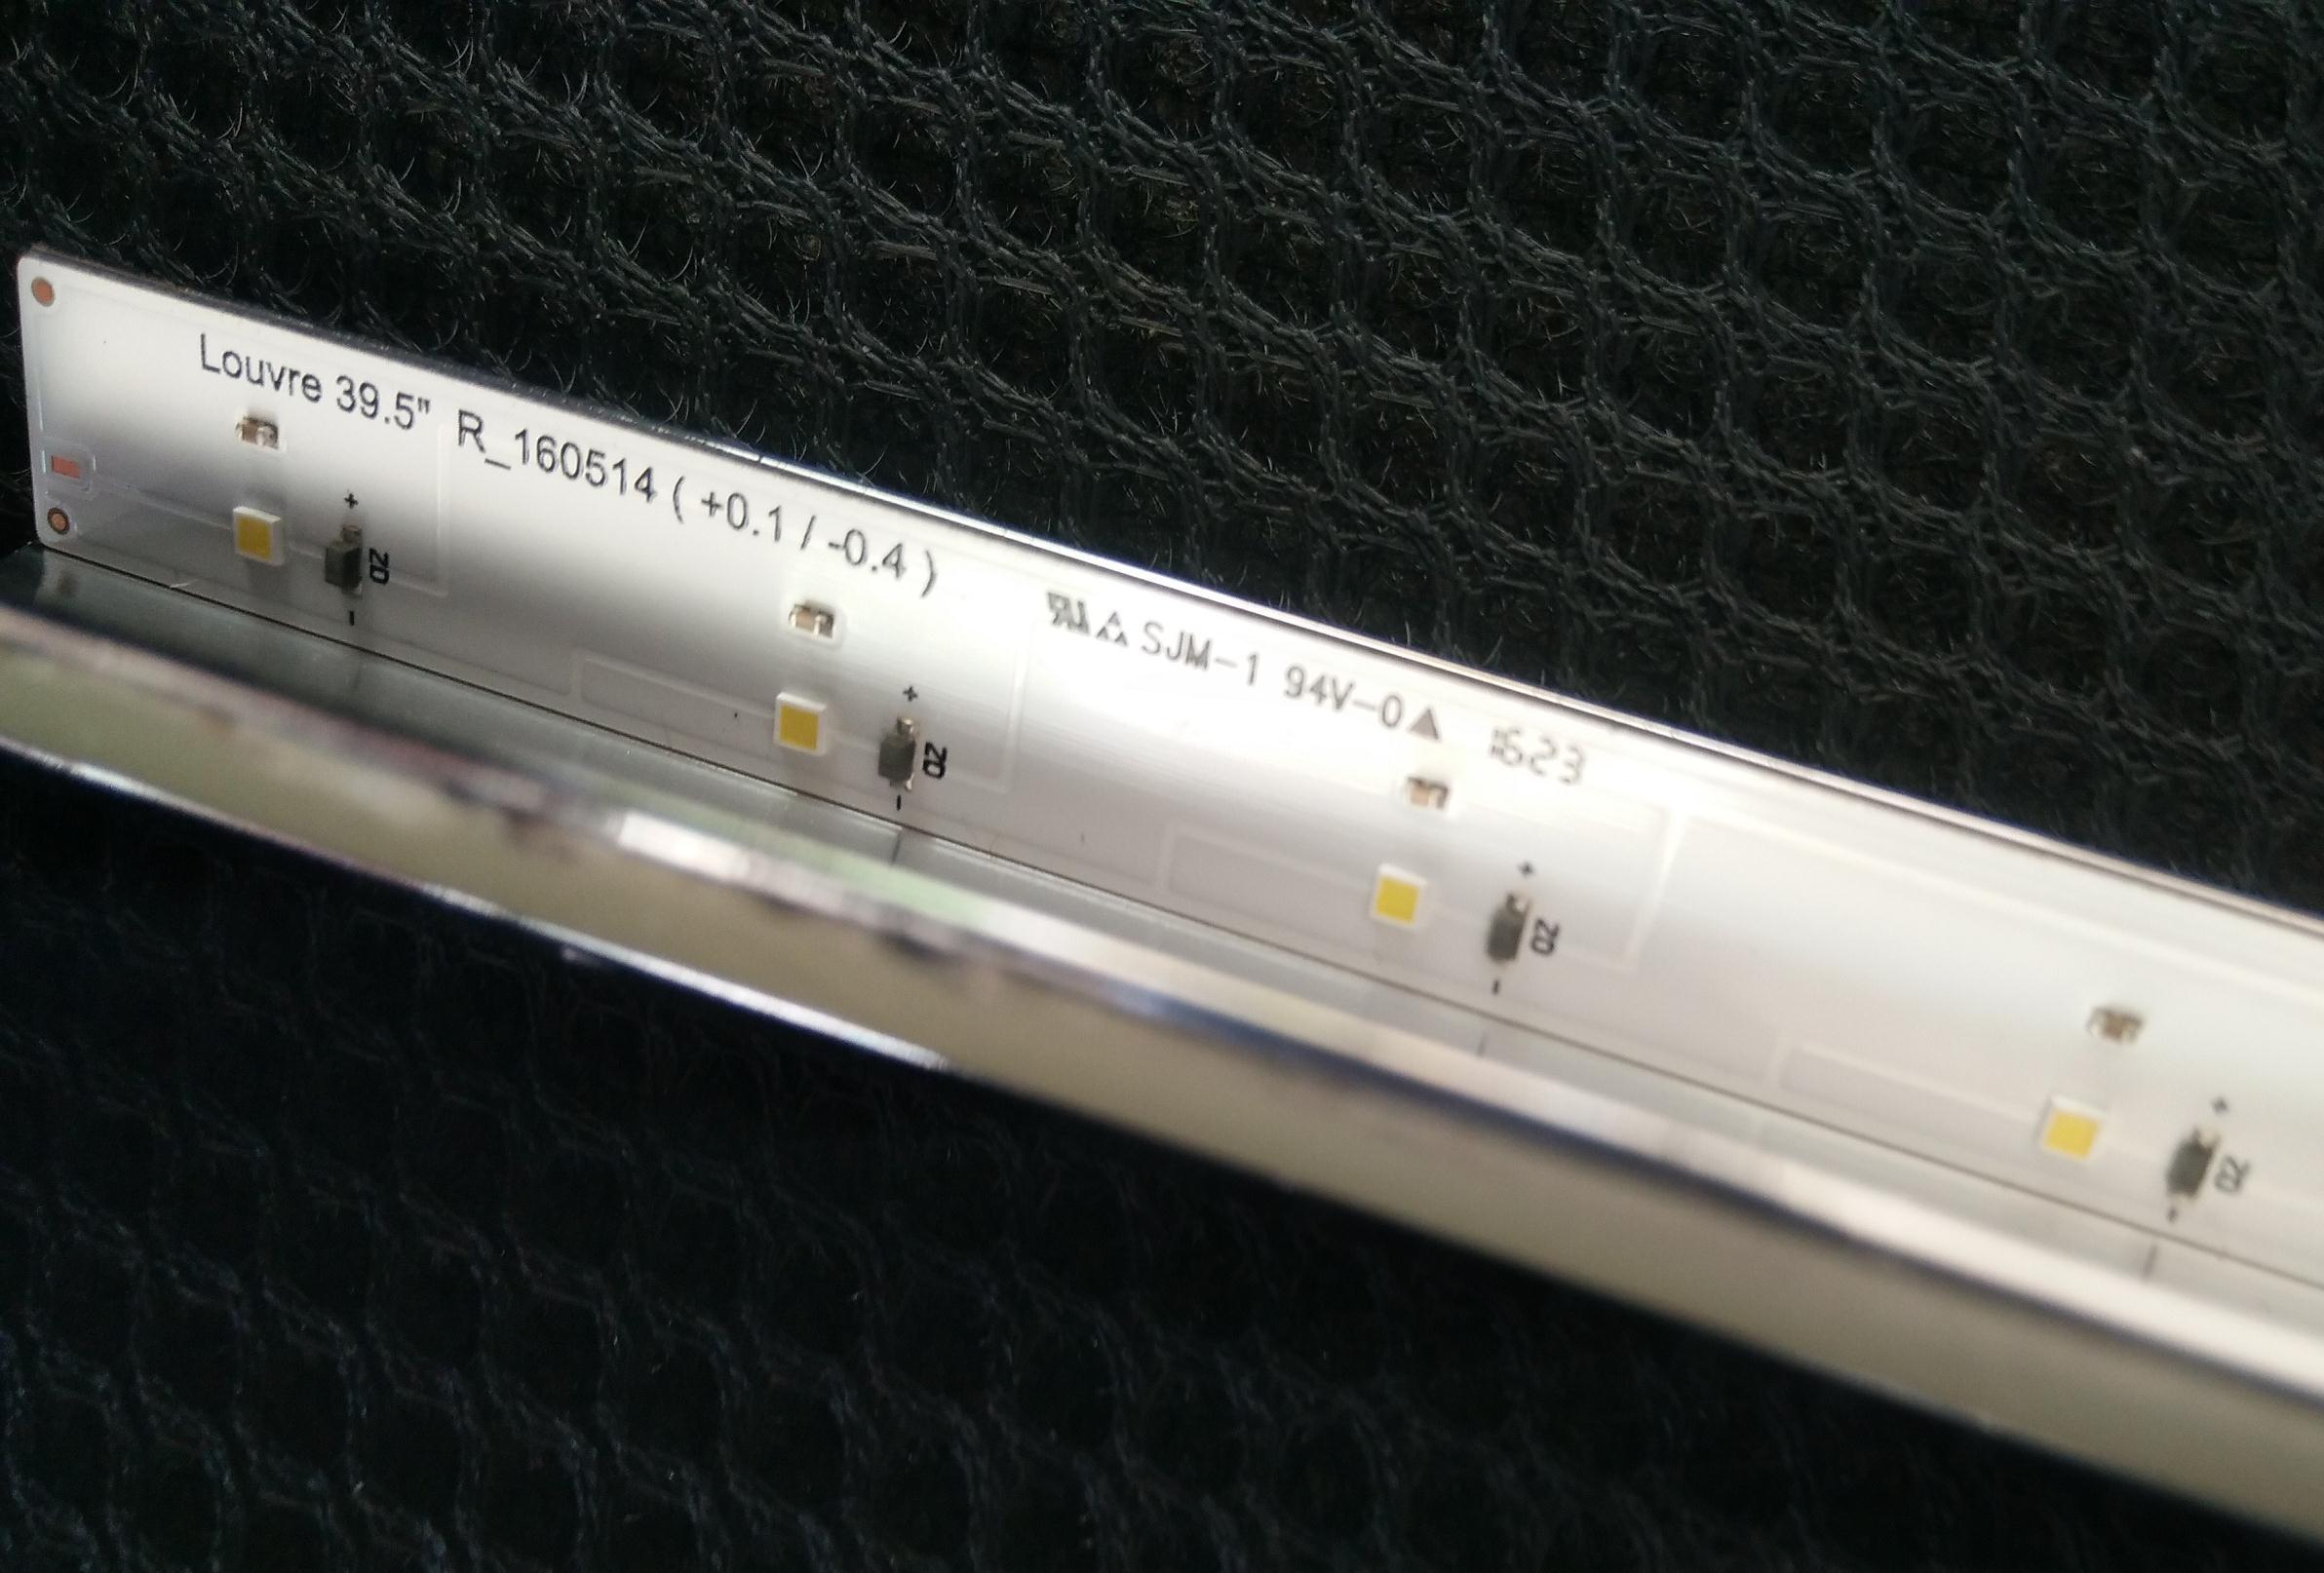 5 Set = 10 Stuks Led Strip Voor Samsung V6lf_395sfb_led21 _-3-11_R3 V6lf_395sfa BN96-4655A 4656A 39720A 39721A UA40K5300 UN40K5100AF